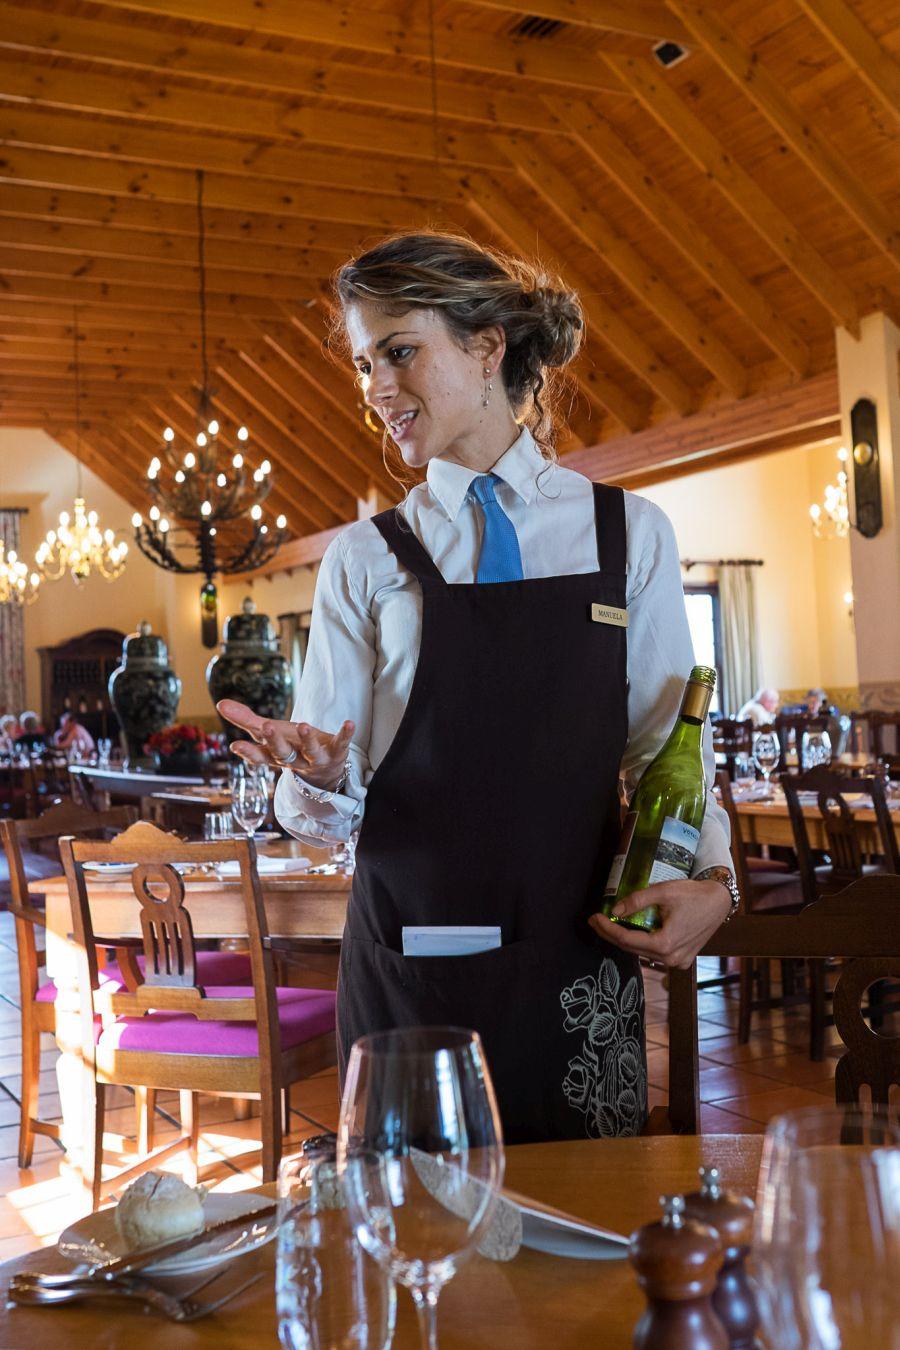 Our waiter Manuela